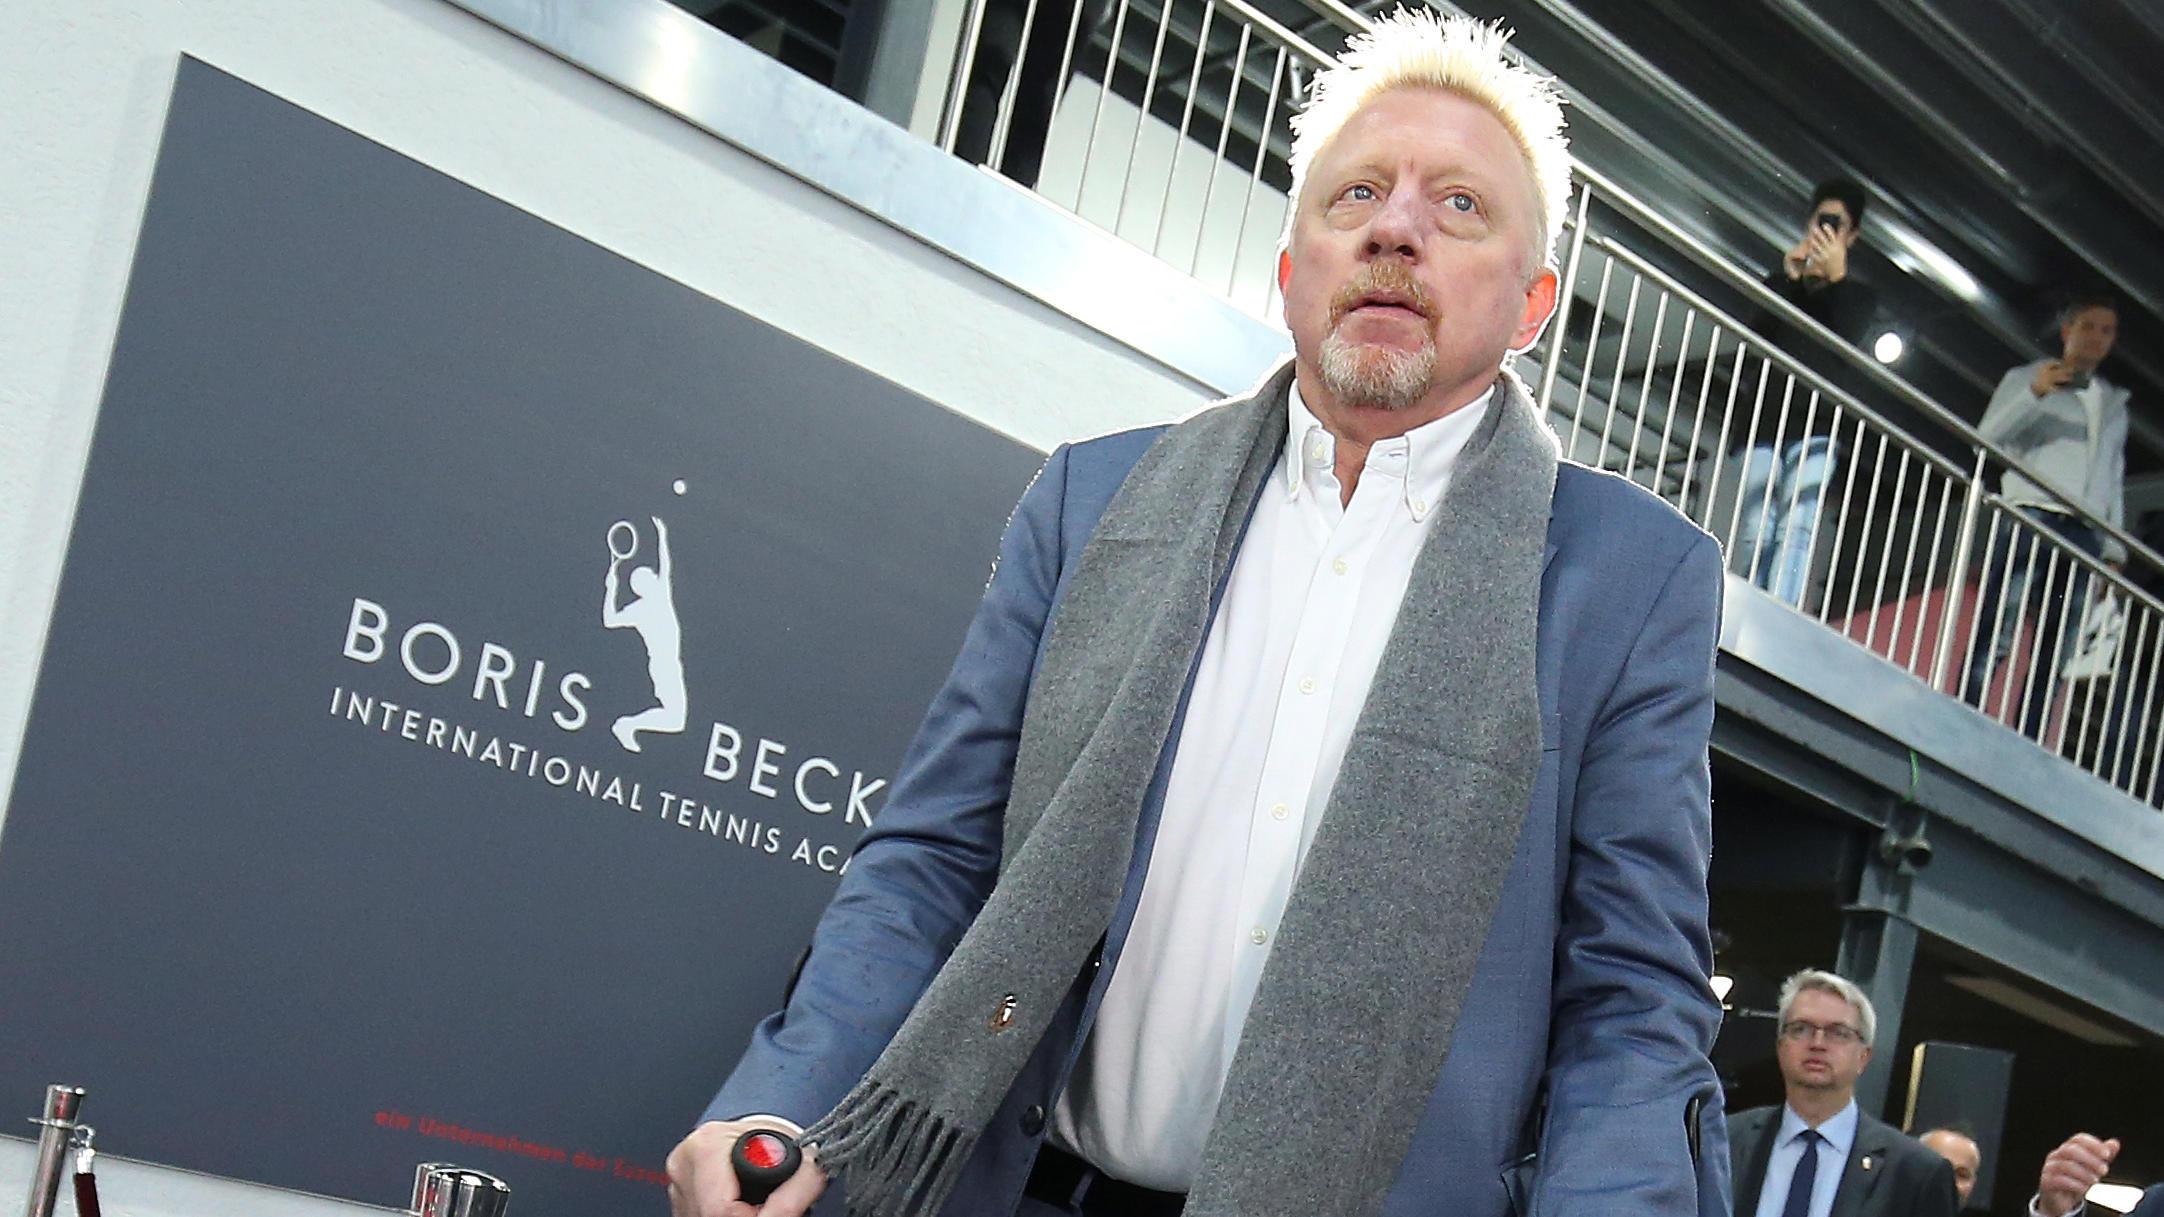 Boris Becker 2021